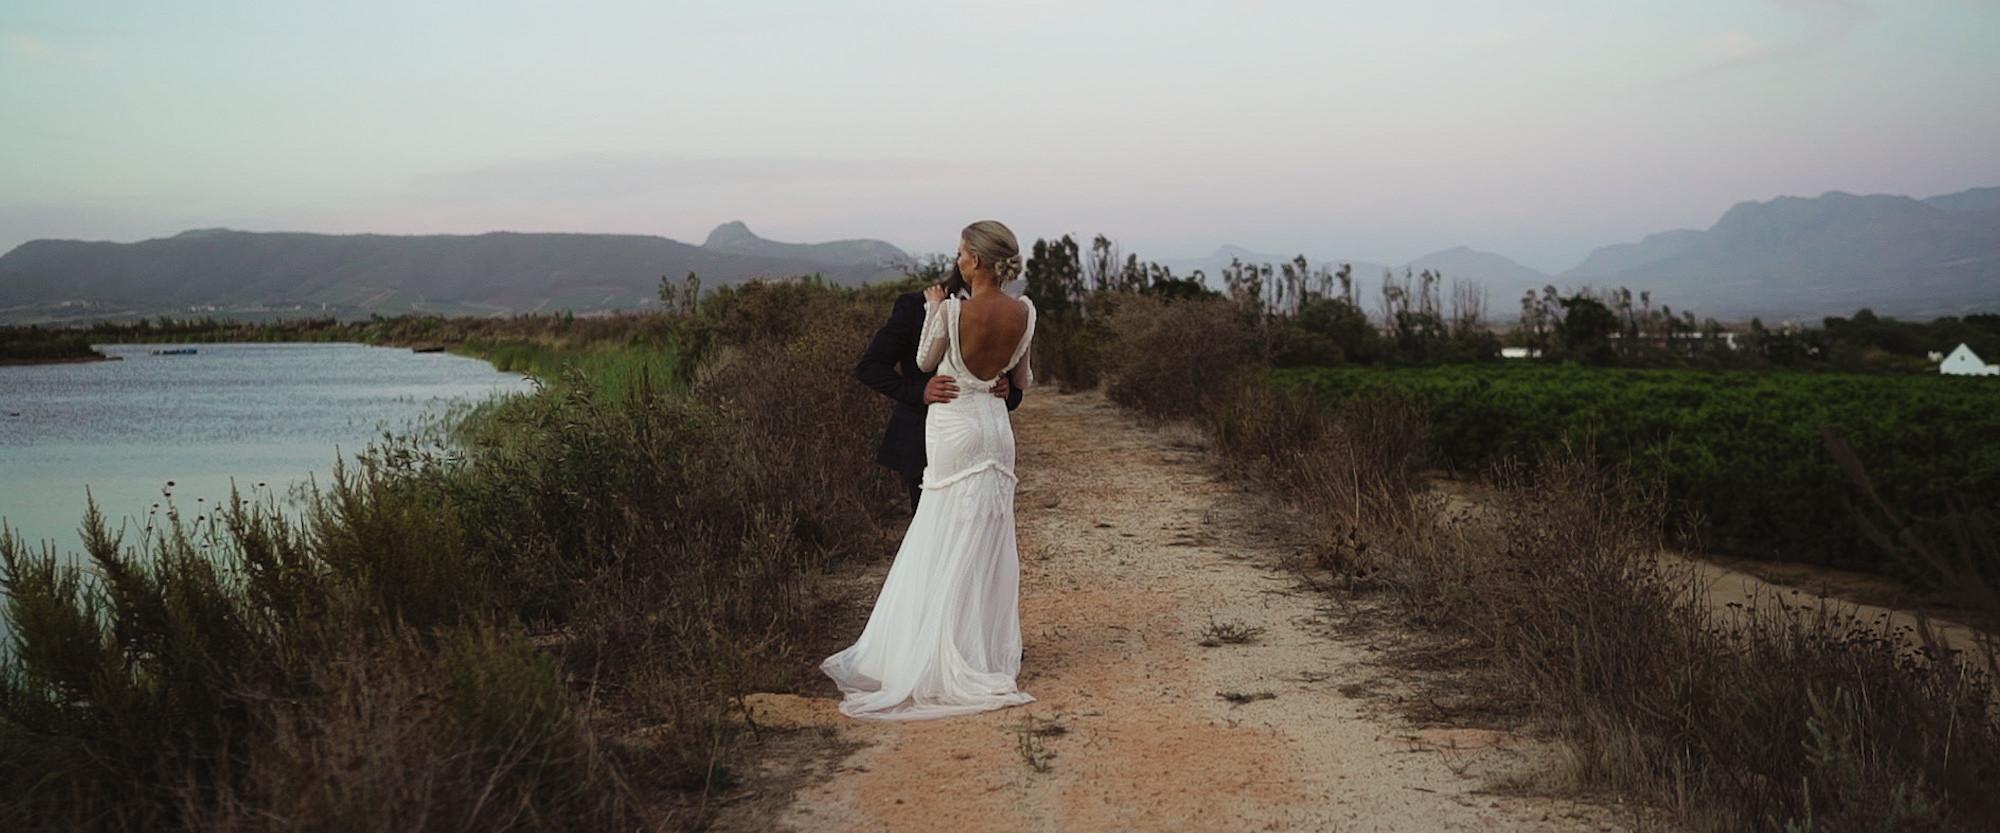 HeathEmelieWeddingFilm_Babylonstoren_Wedding_10.jpg